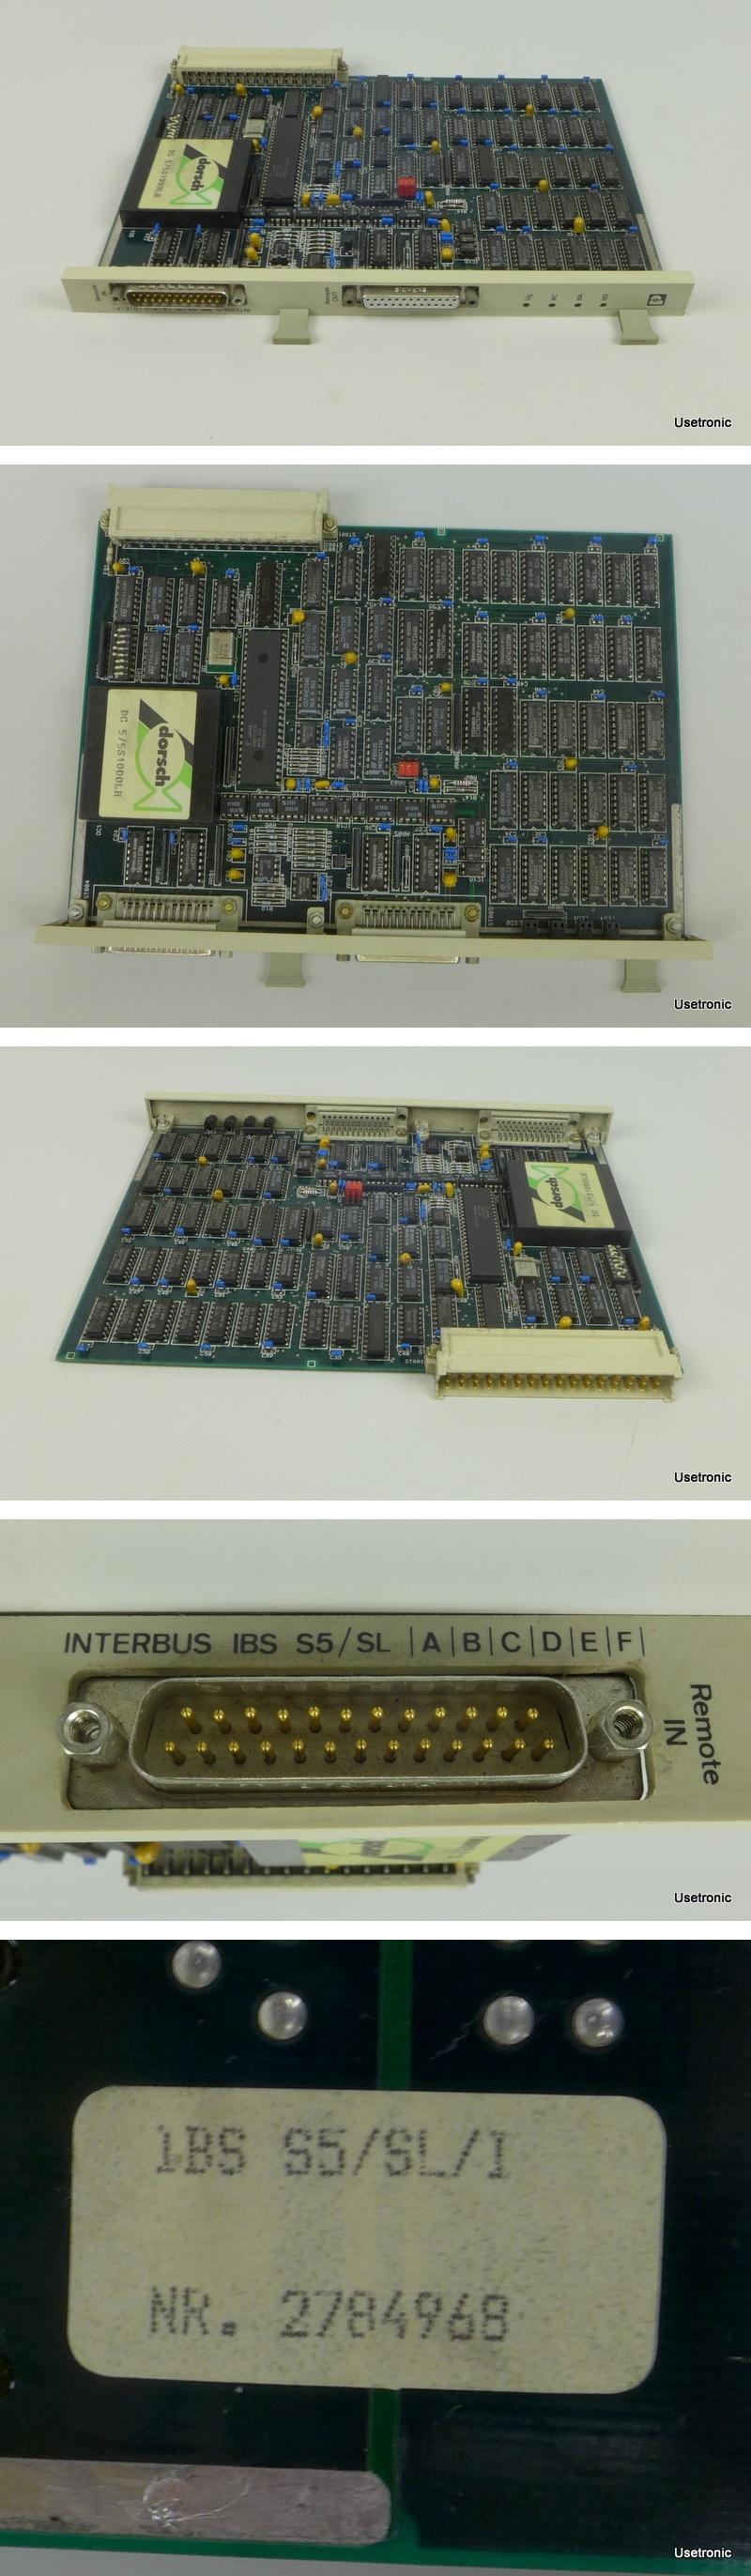 Phoenix IBS S5/SL